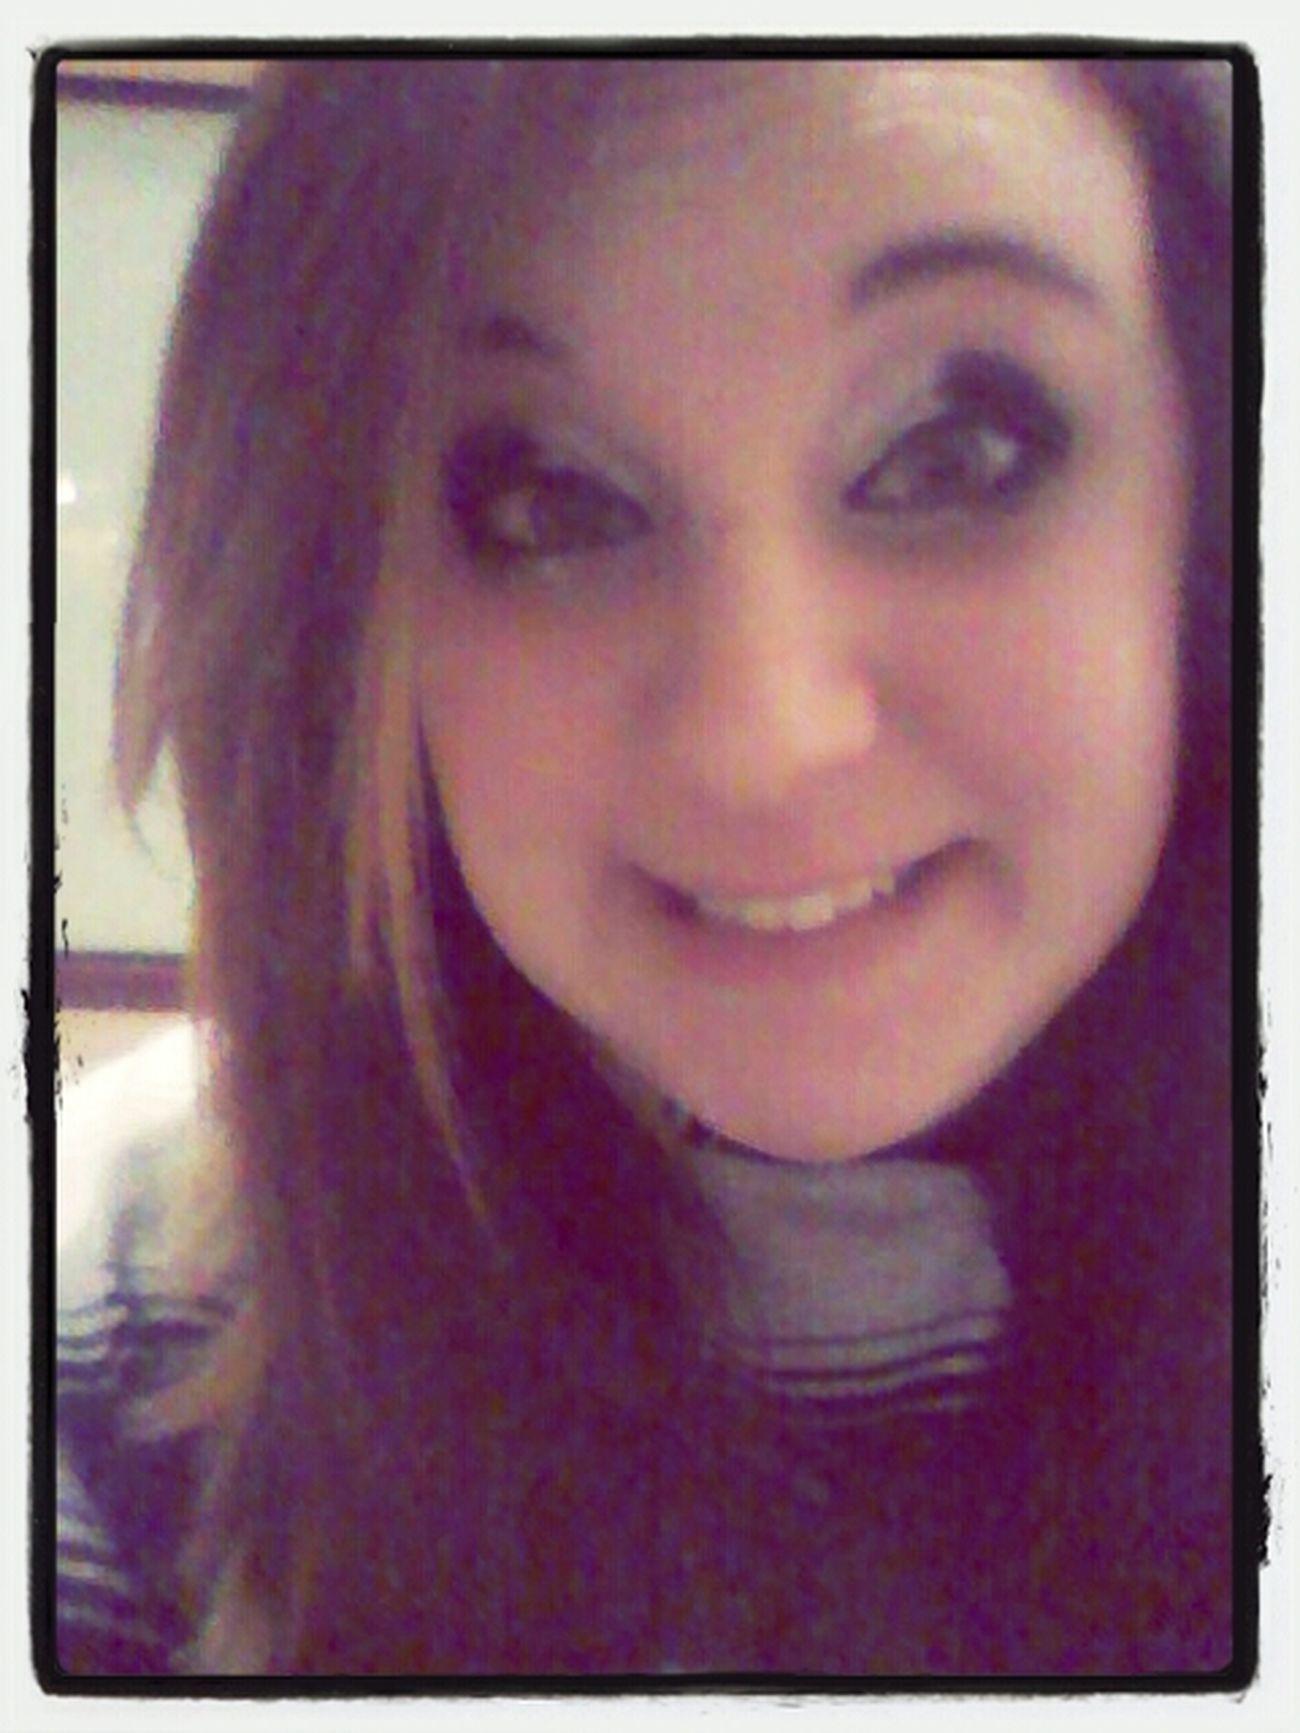 #creepyface #bored #waiting #atthemall